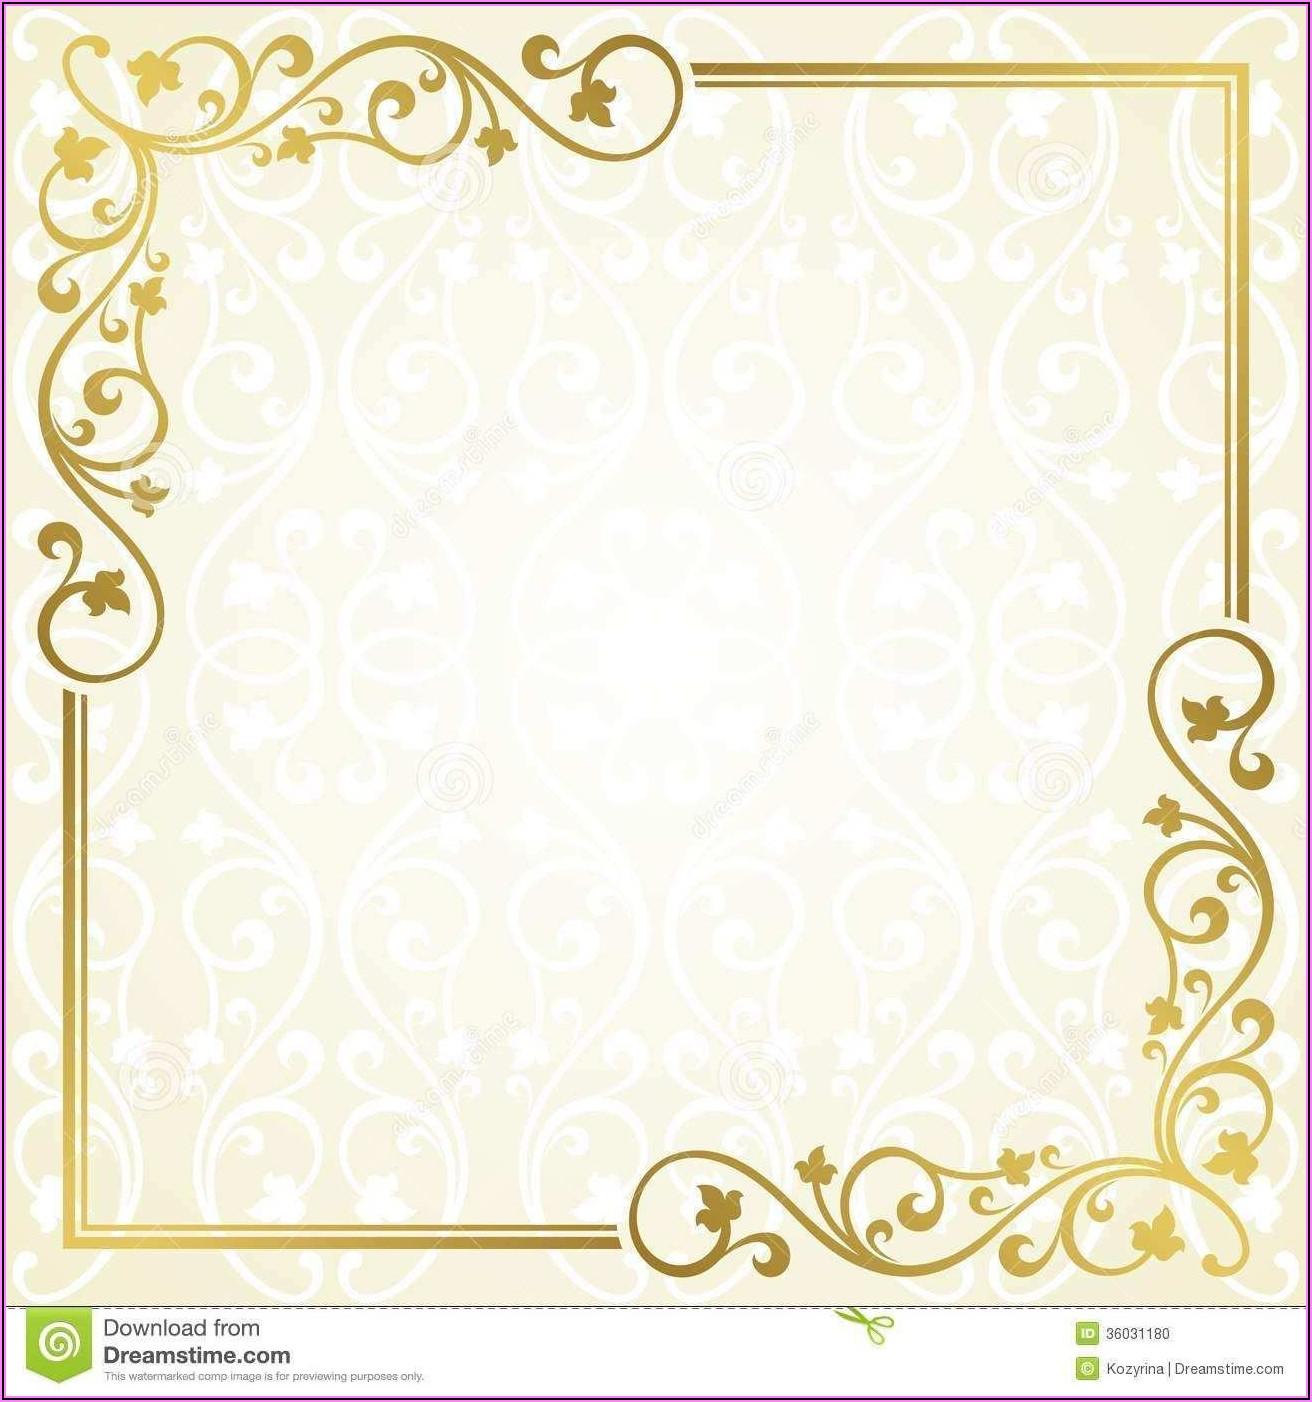 Invitation Card Blank Design Template